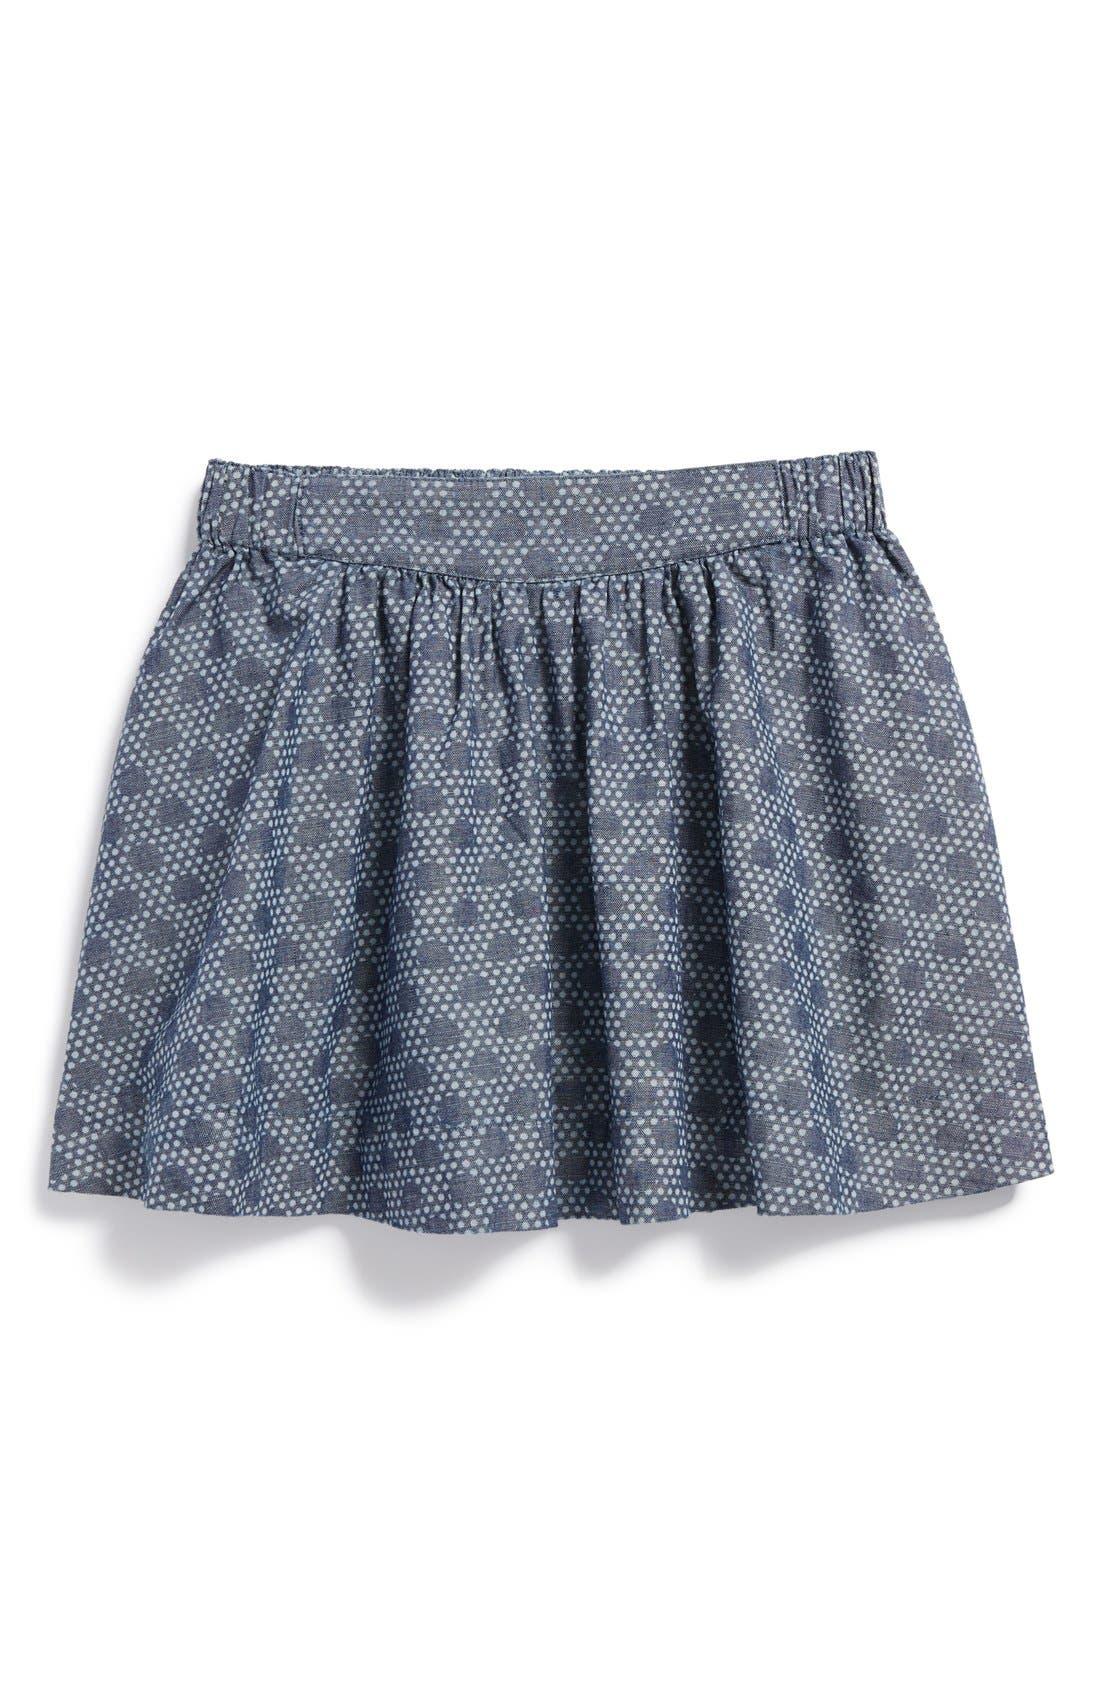 'Unity' Chambray Twirl Skirt,                         Main,                         color, 410